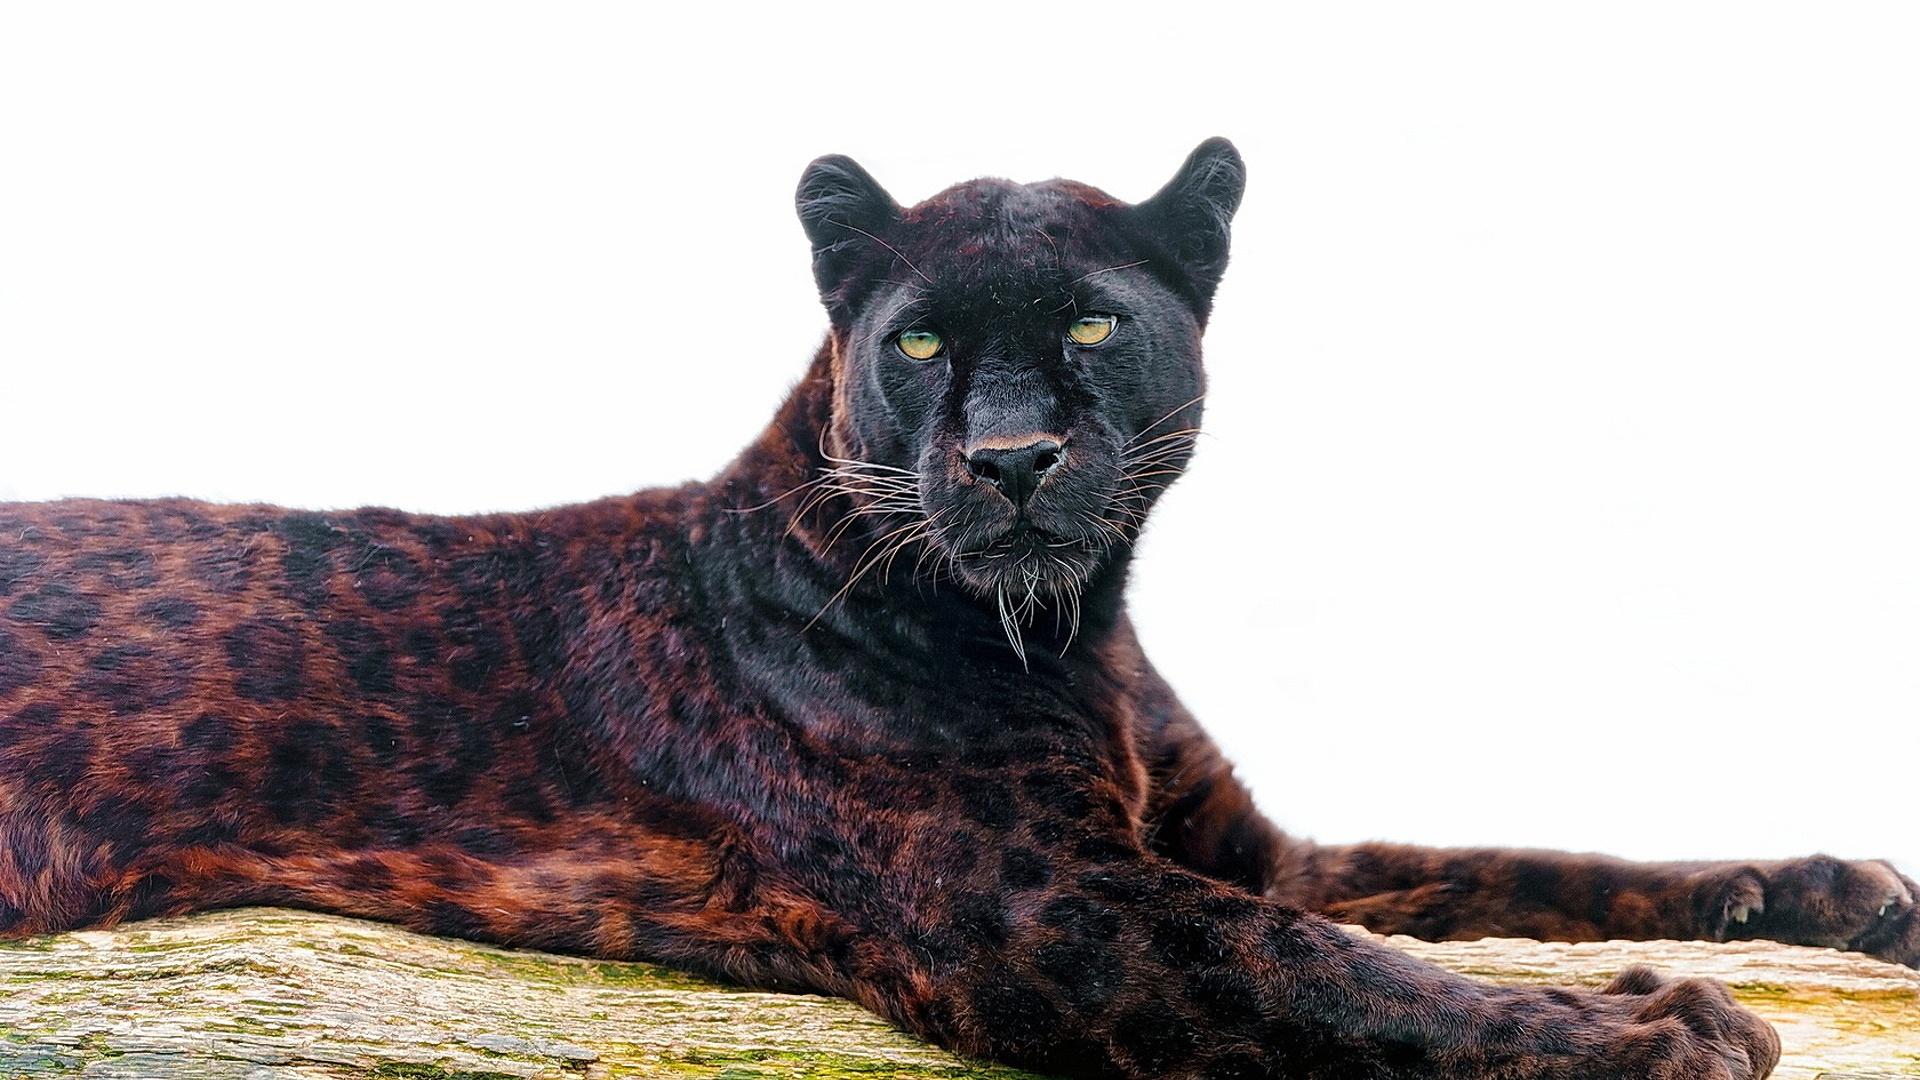 Black jaguar full hd wallpaper and background image 1920x1080 id animal jaguar wallpaper voltagebd Choice Image